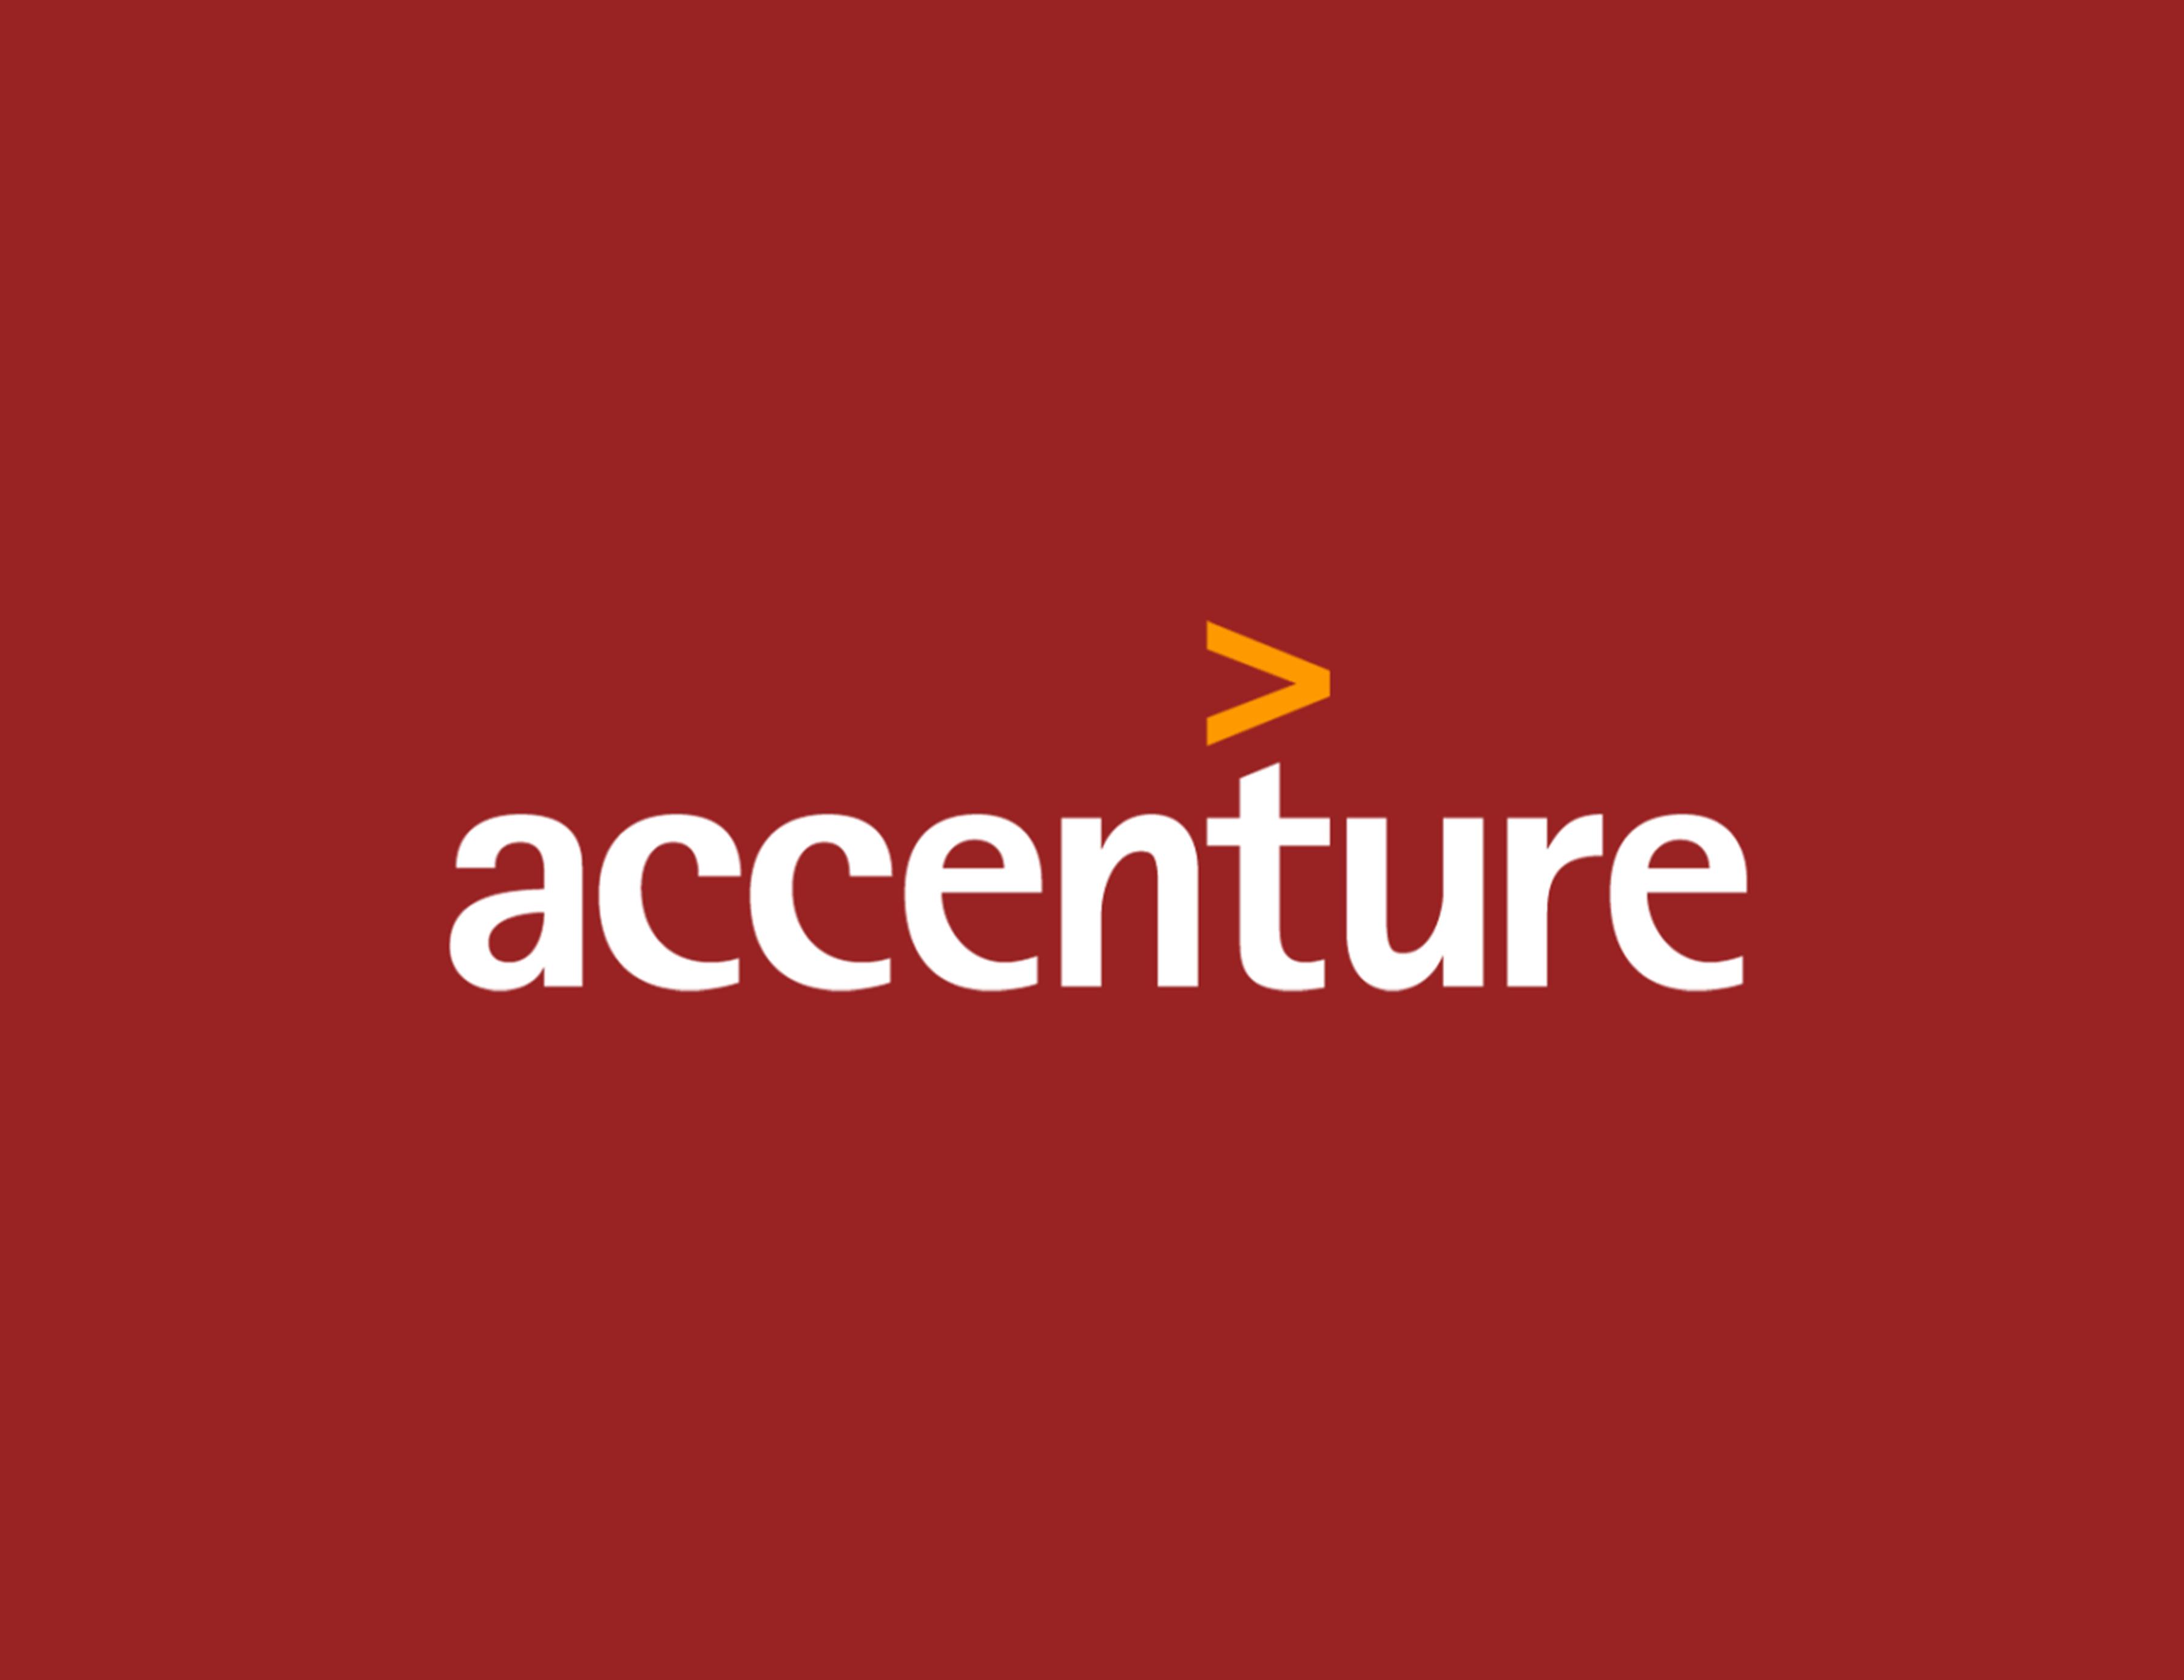 accenture logo - management consulting logo inspiration ...